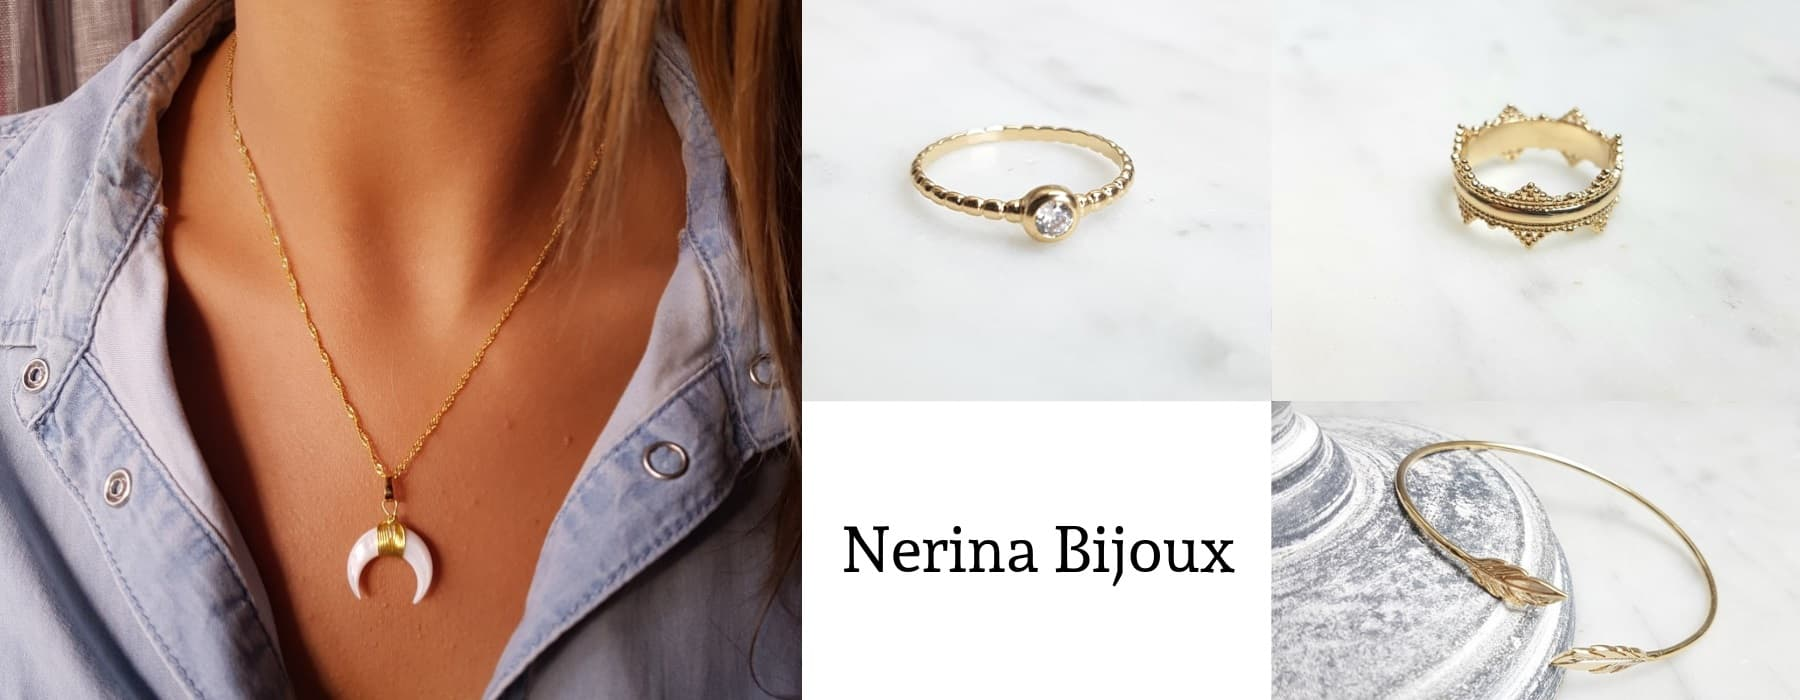 Nerina Bijoux : Bijoux plaqué or et bijou argent 925 rhodié